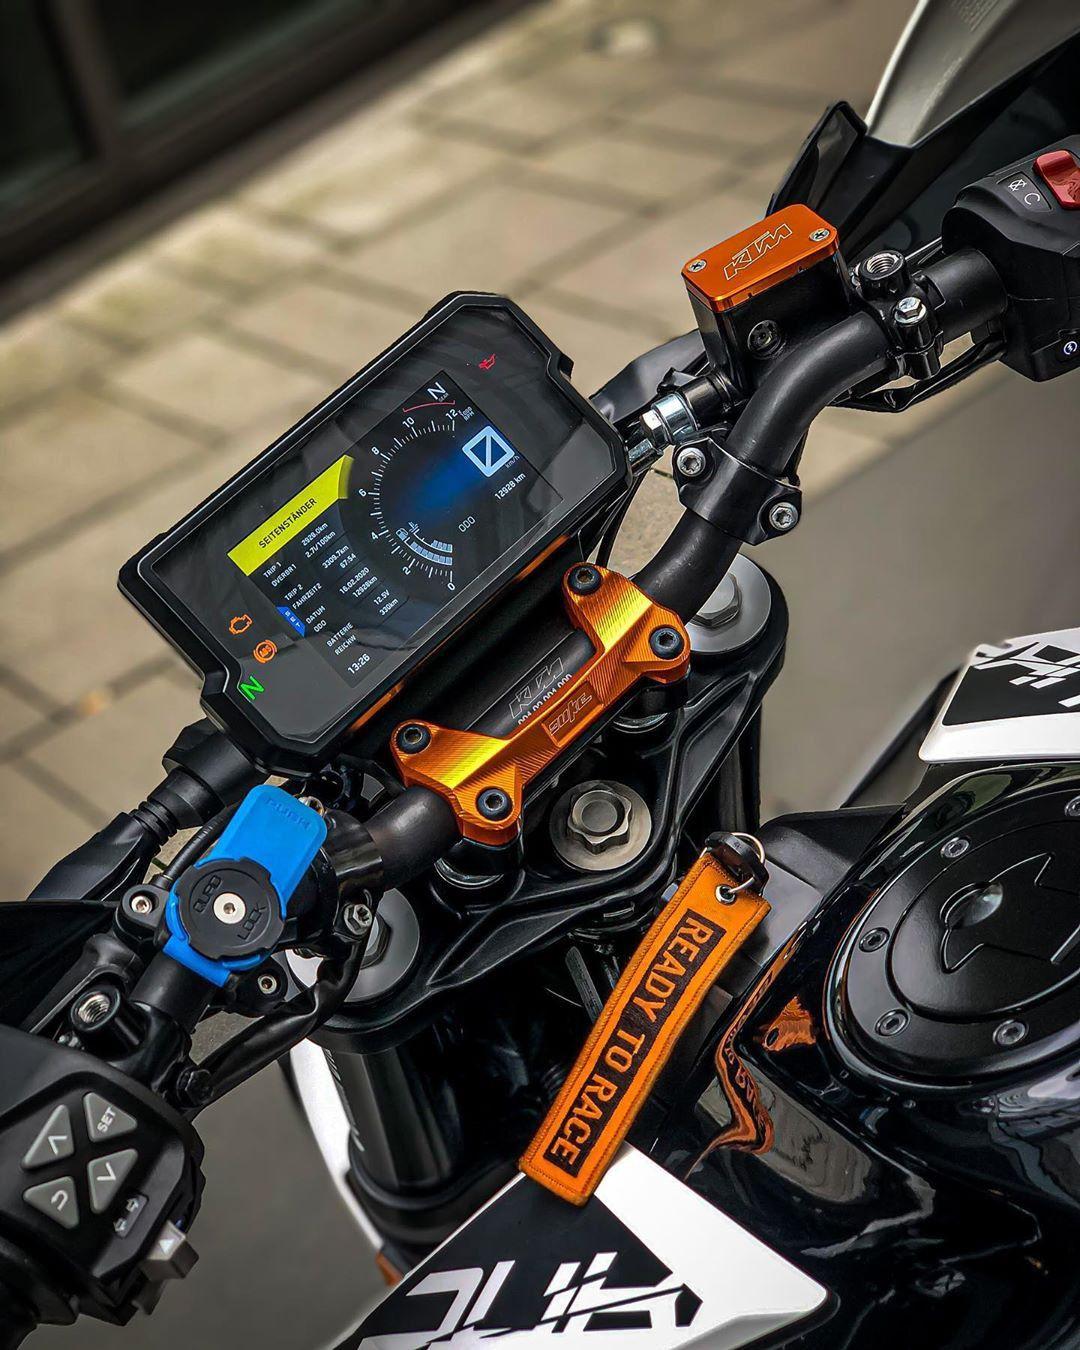 Pin by jaydeep kerketta on ktm in 2020 Bike pic, Yamaha